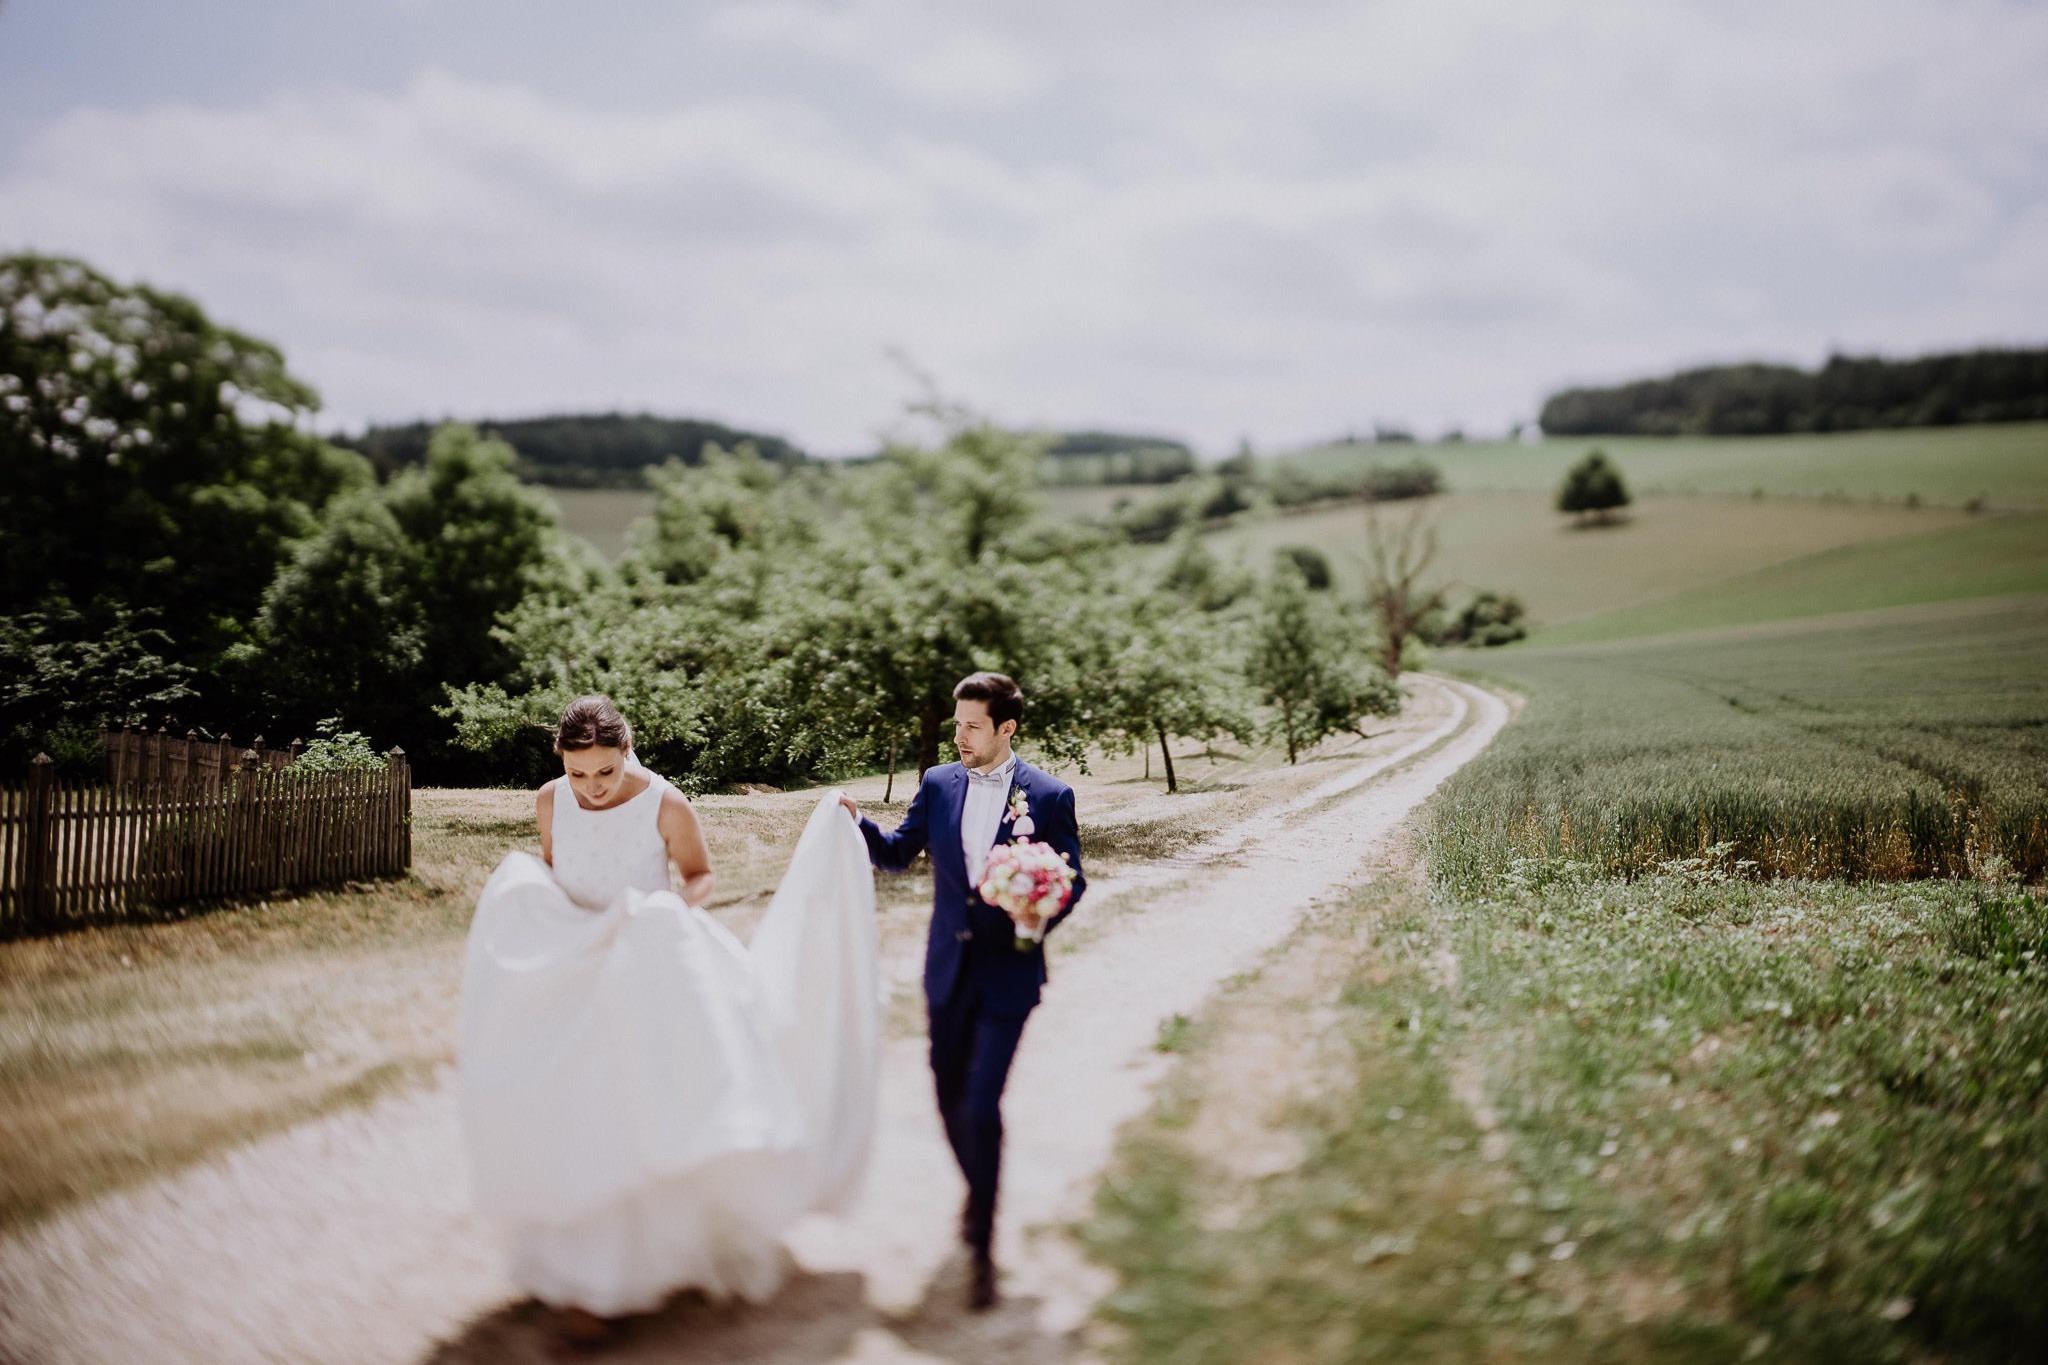 wedding photographer hamilton new zealand 1025 3